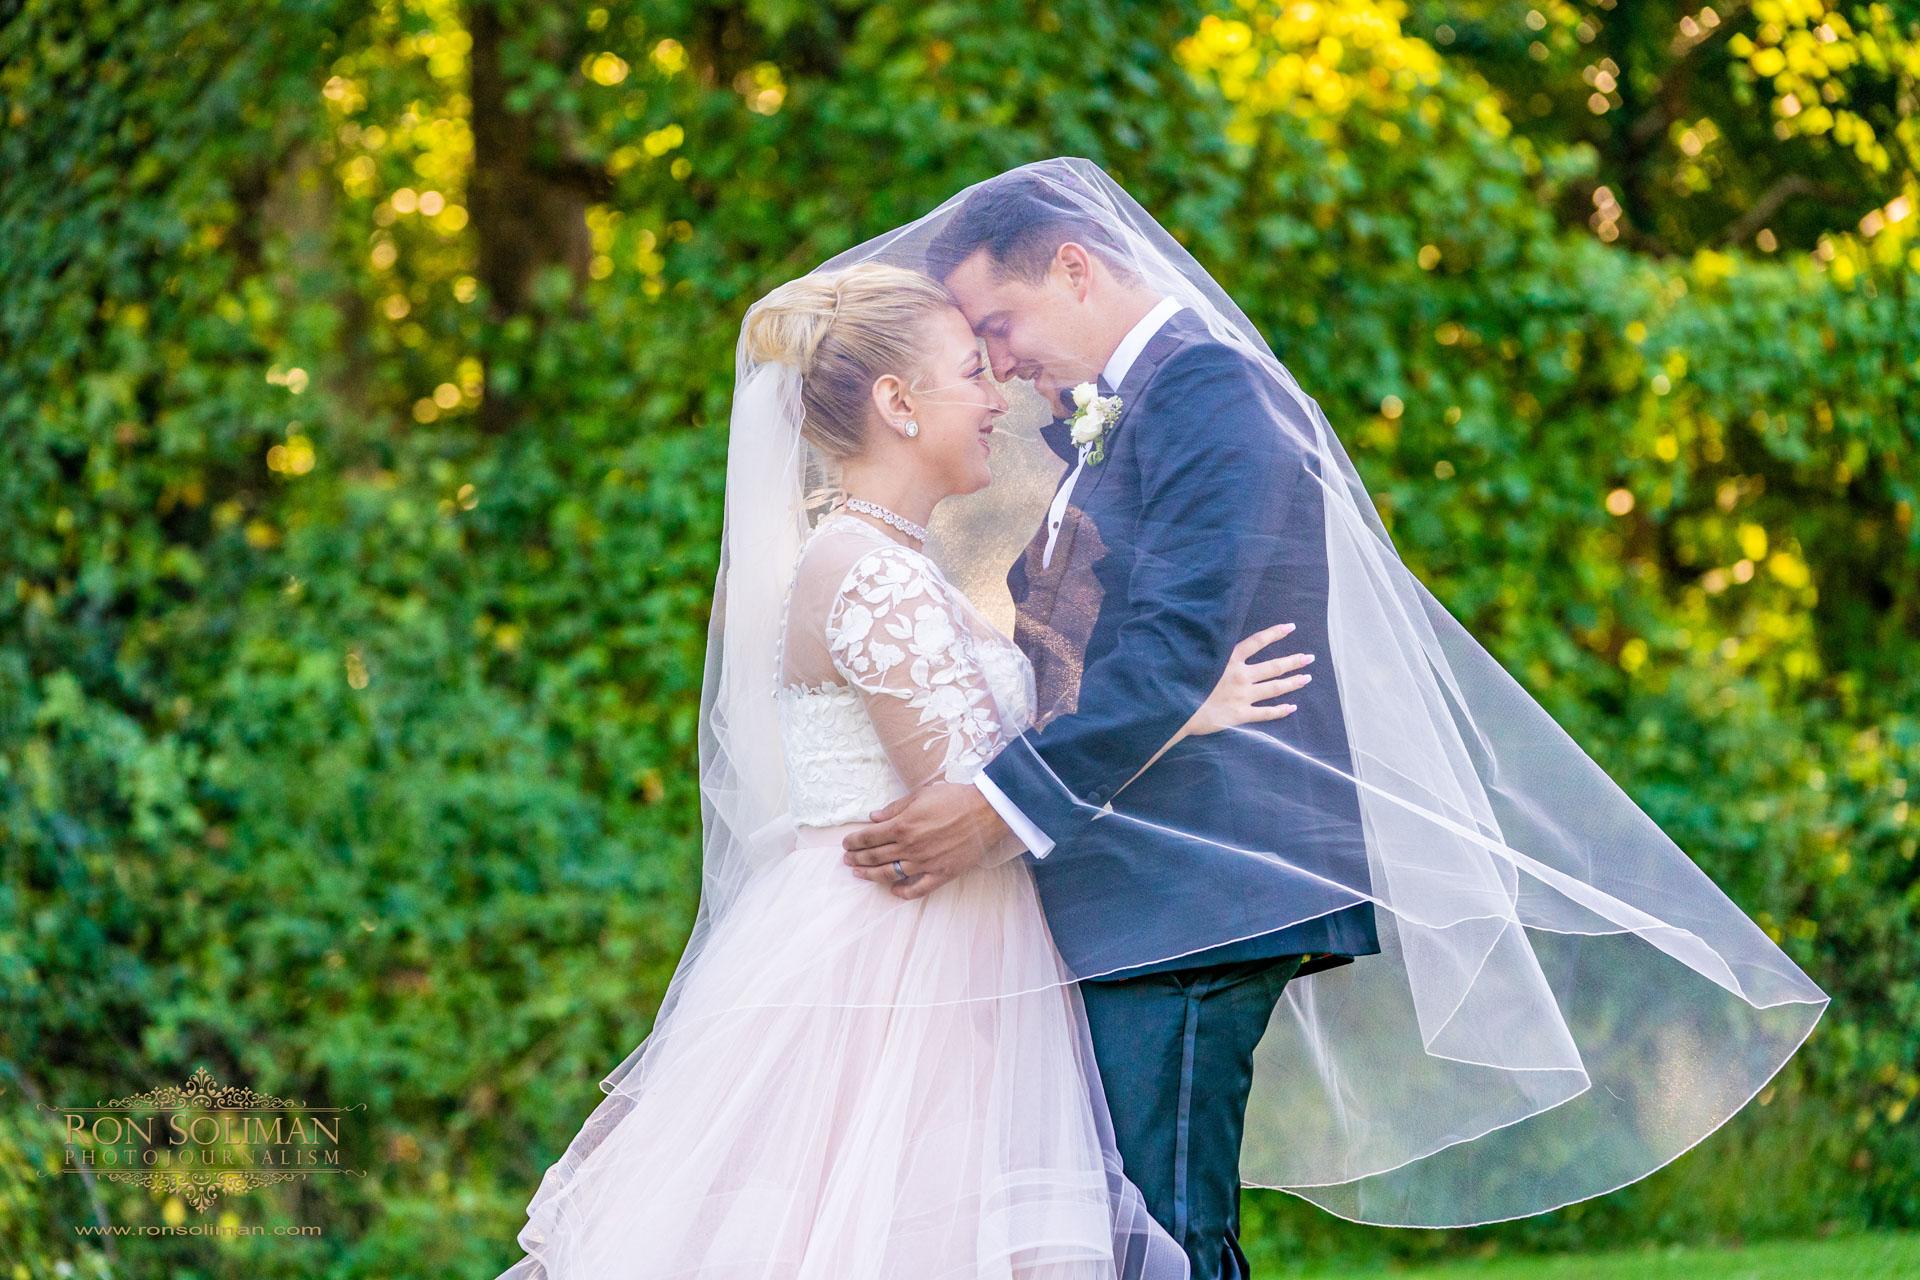 ALVERTHORPE MANOR HOUSE WEDDING 14